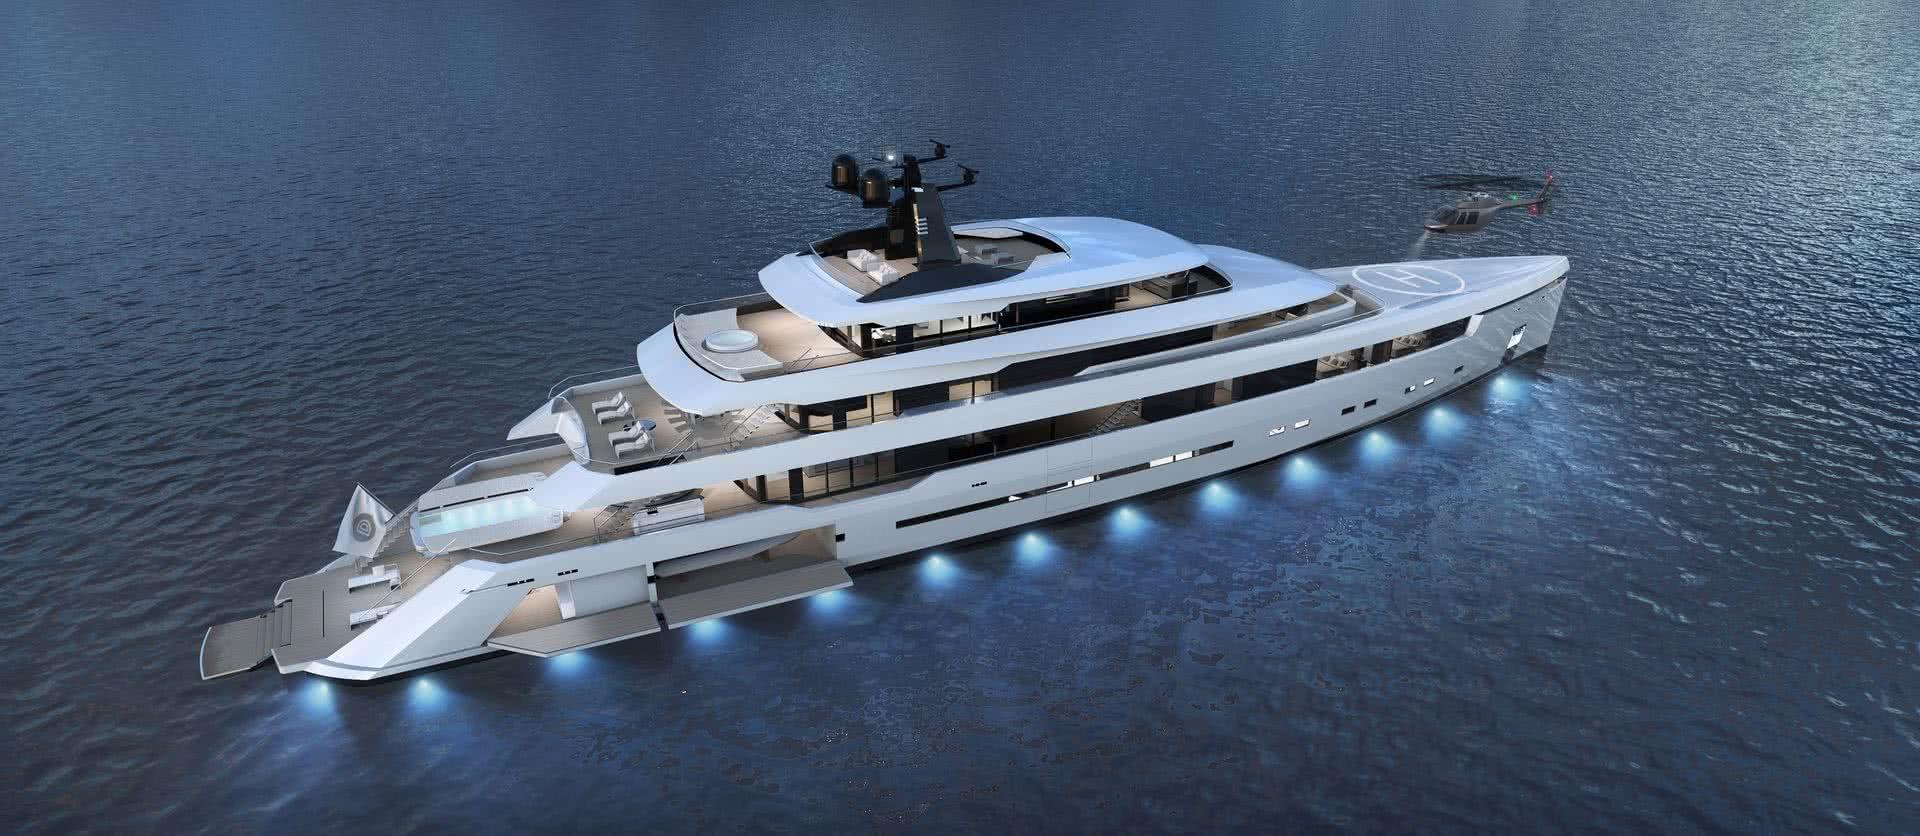 Starlight Yacht Darnet Design